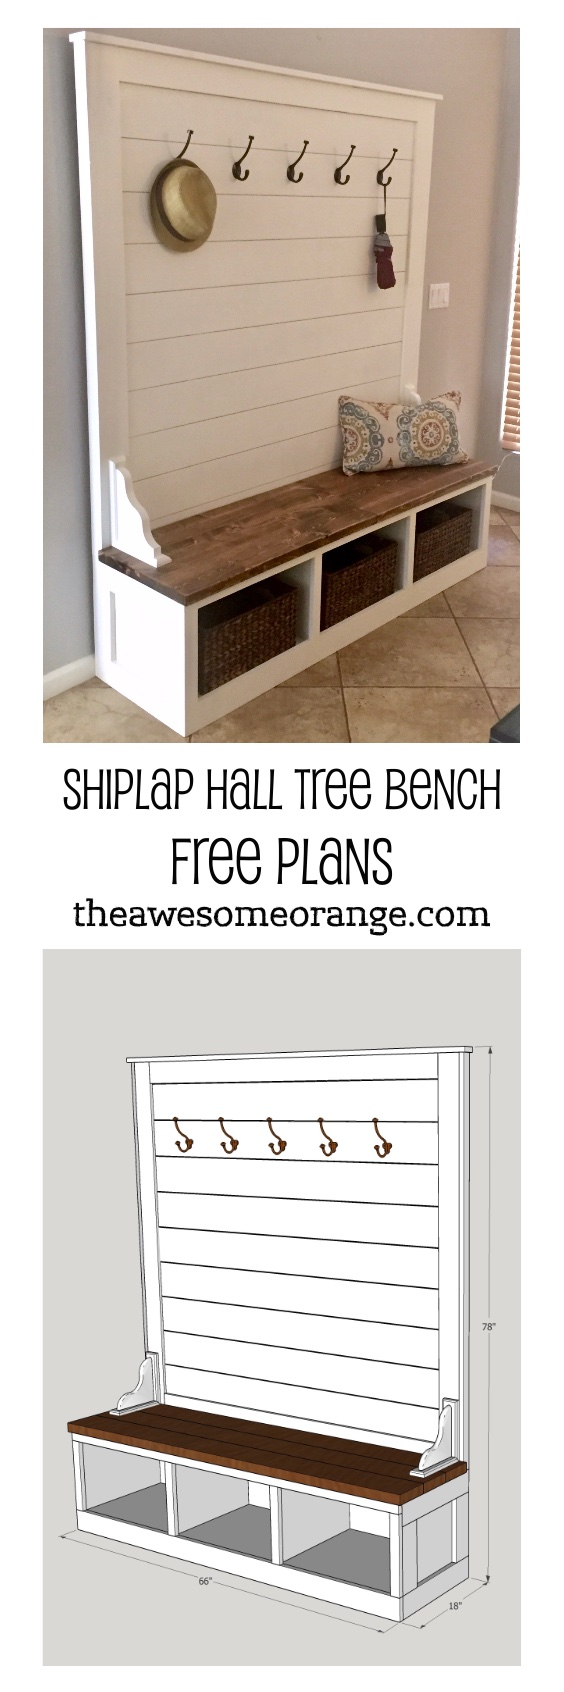 Pinterest Pin - Shiplap Hall Tree Bench.jpg